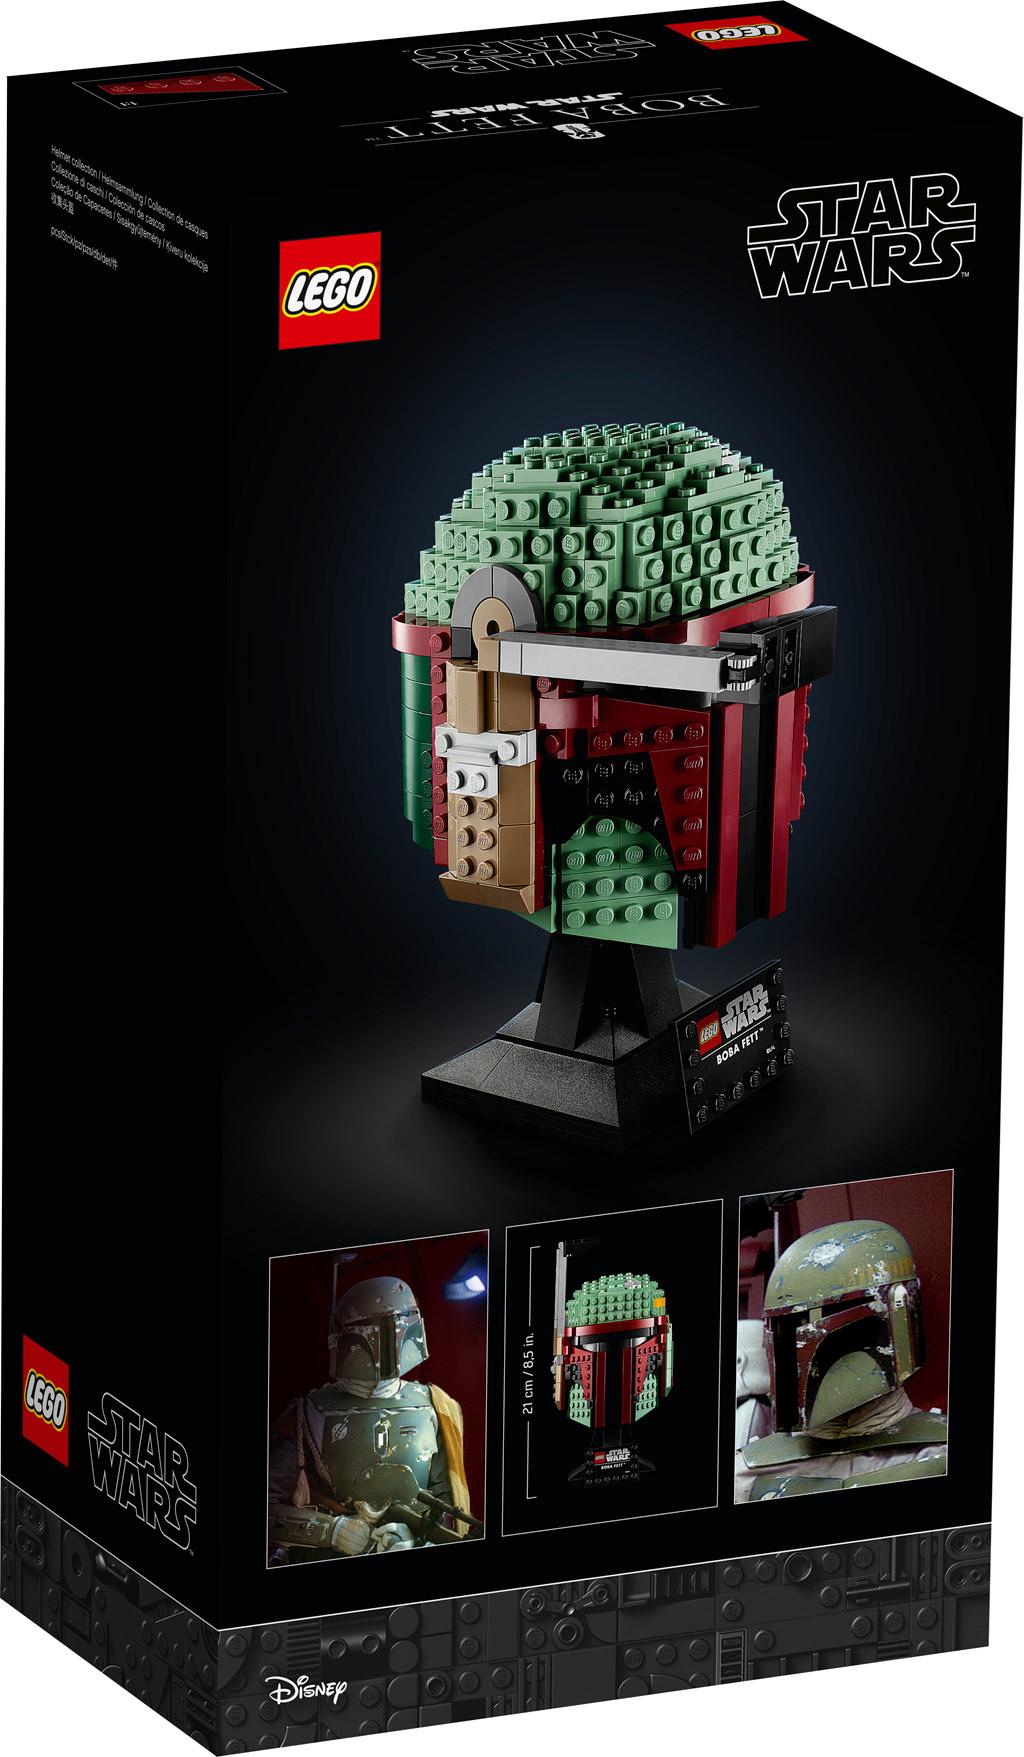 lego-star-wars-75277-boba-fett-box-back-2020 zusammengebaut.com